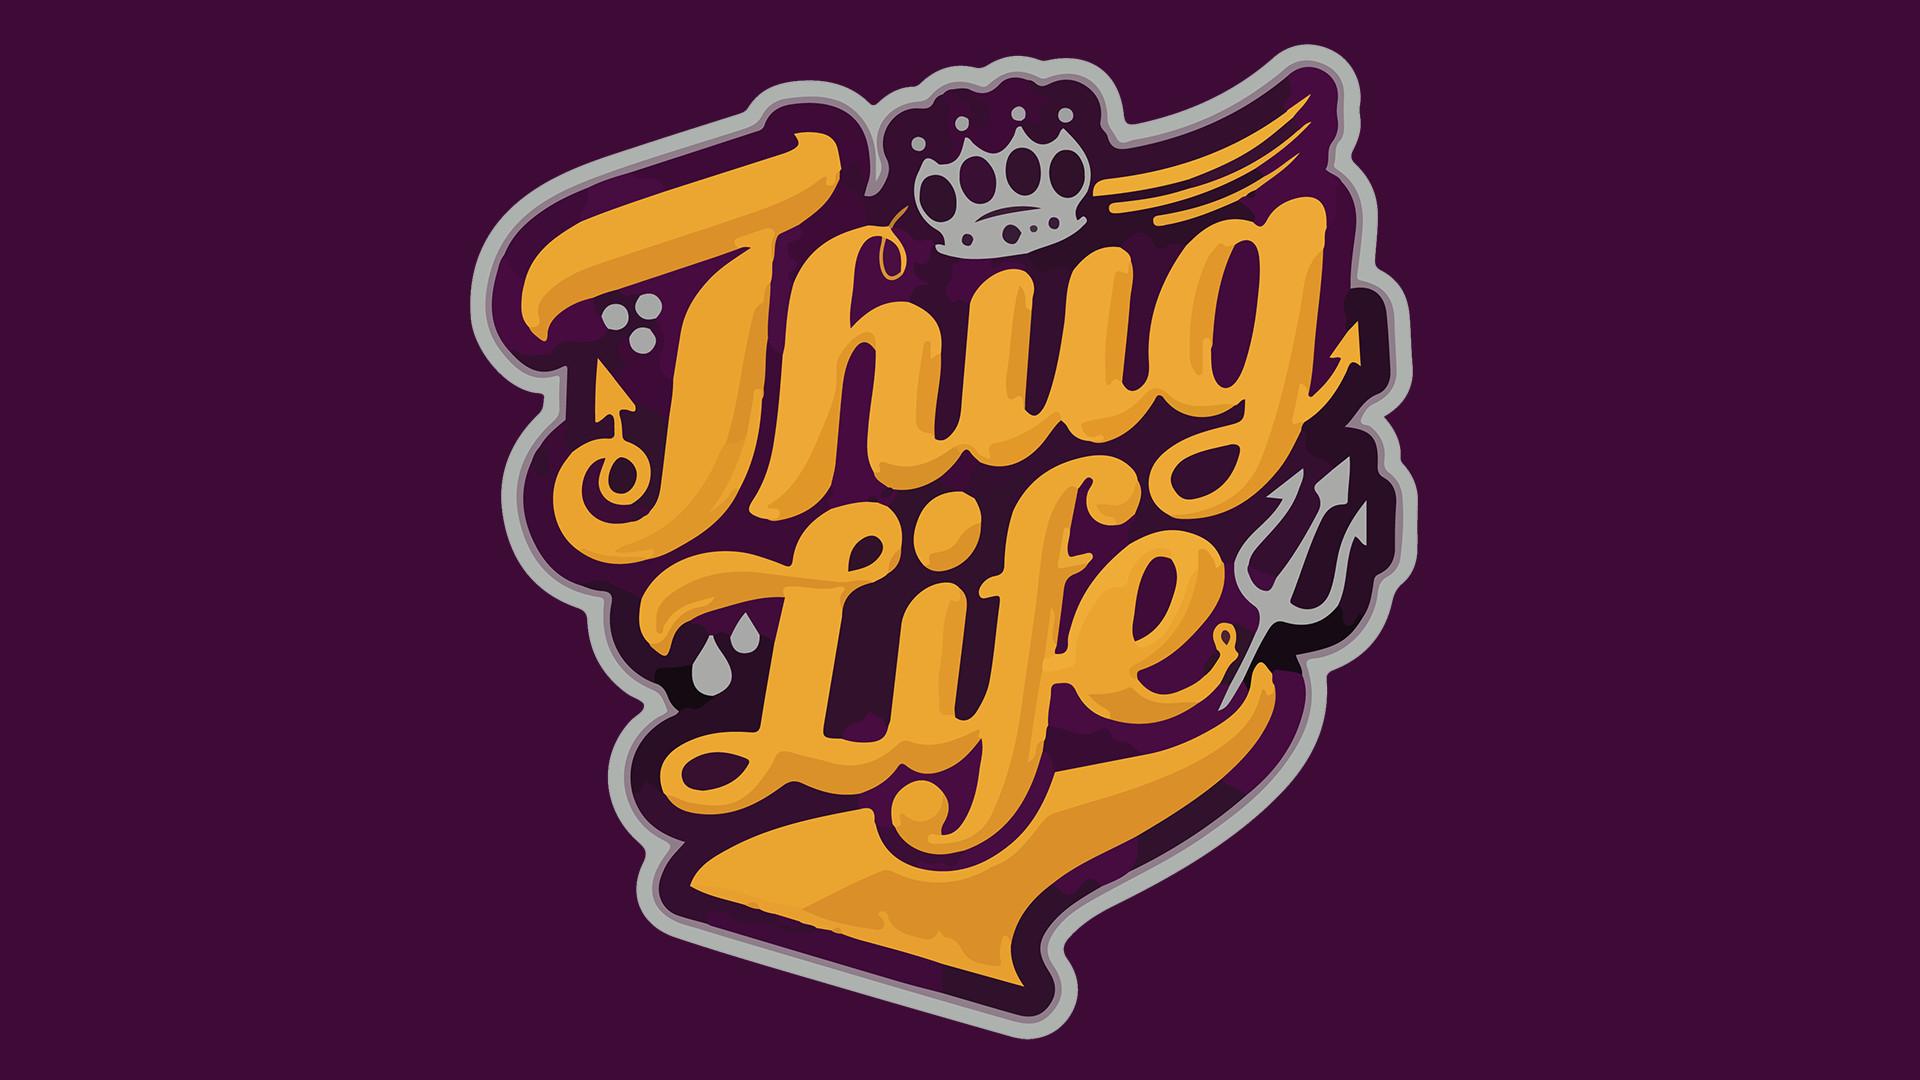 thug life wallpaper 72 images